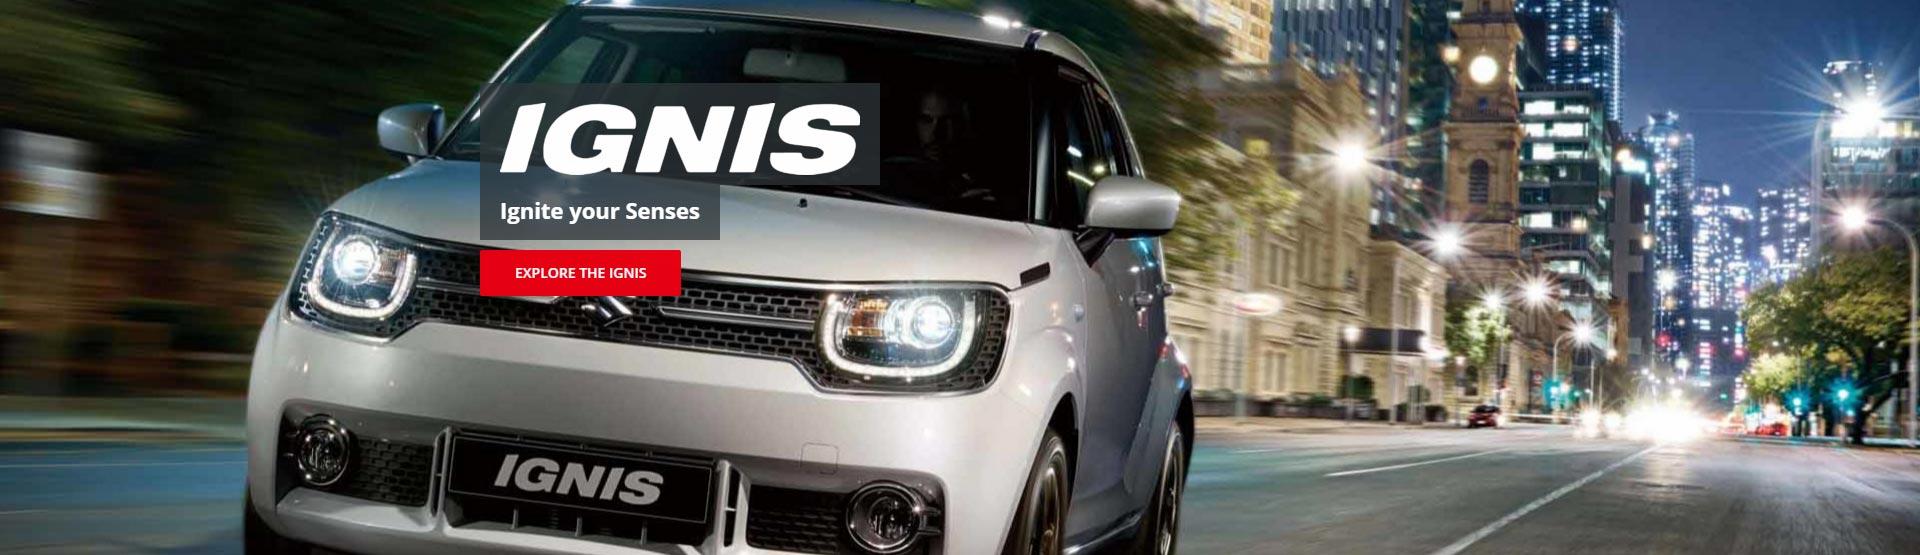 Ignite your senses with the new Suzuki Ignis at Redcliffe Suzuki Brisbane.